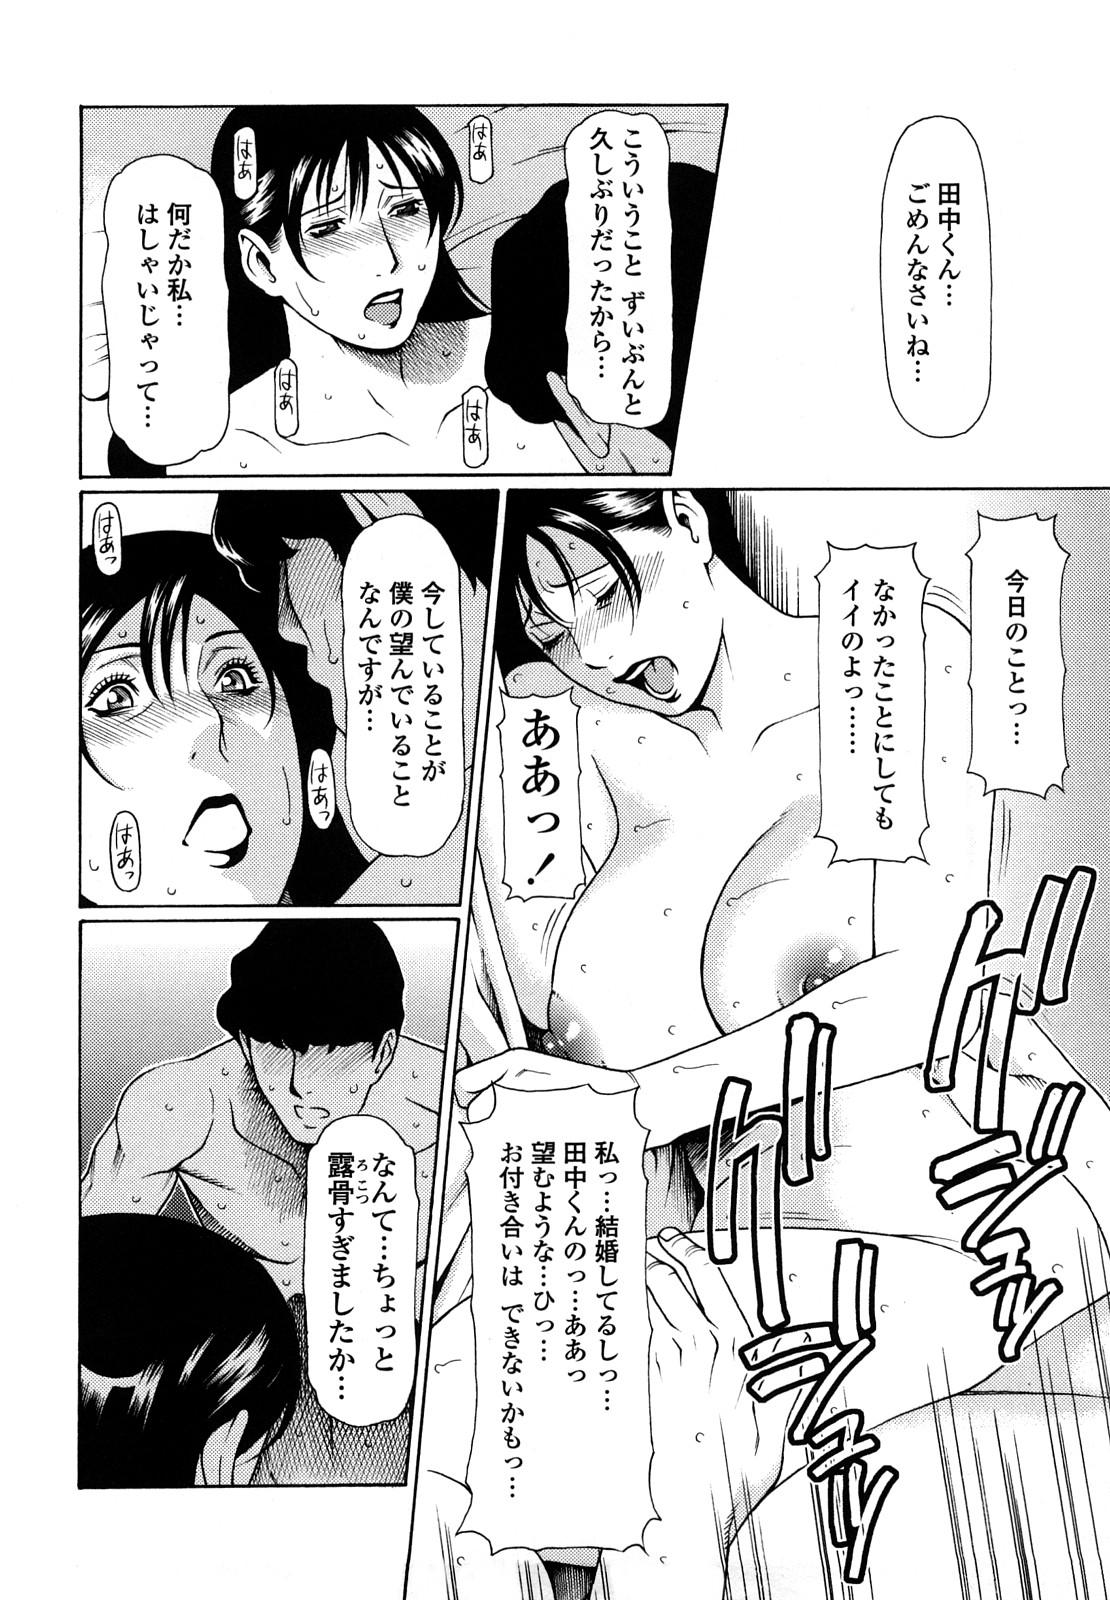 [Takasugi Kou] Kindan no Haha-Ana - Immorality Love-Hole [Decensored] 151